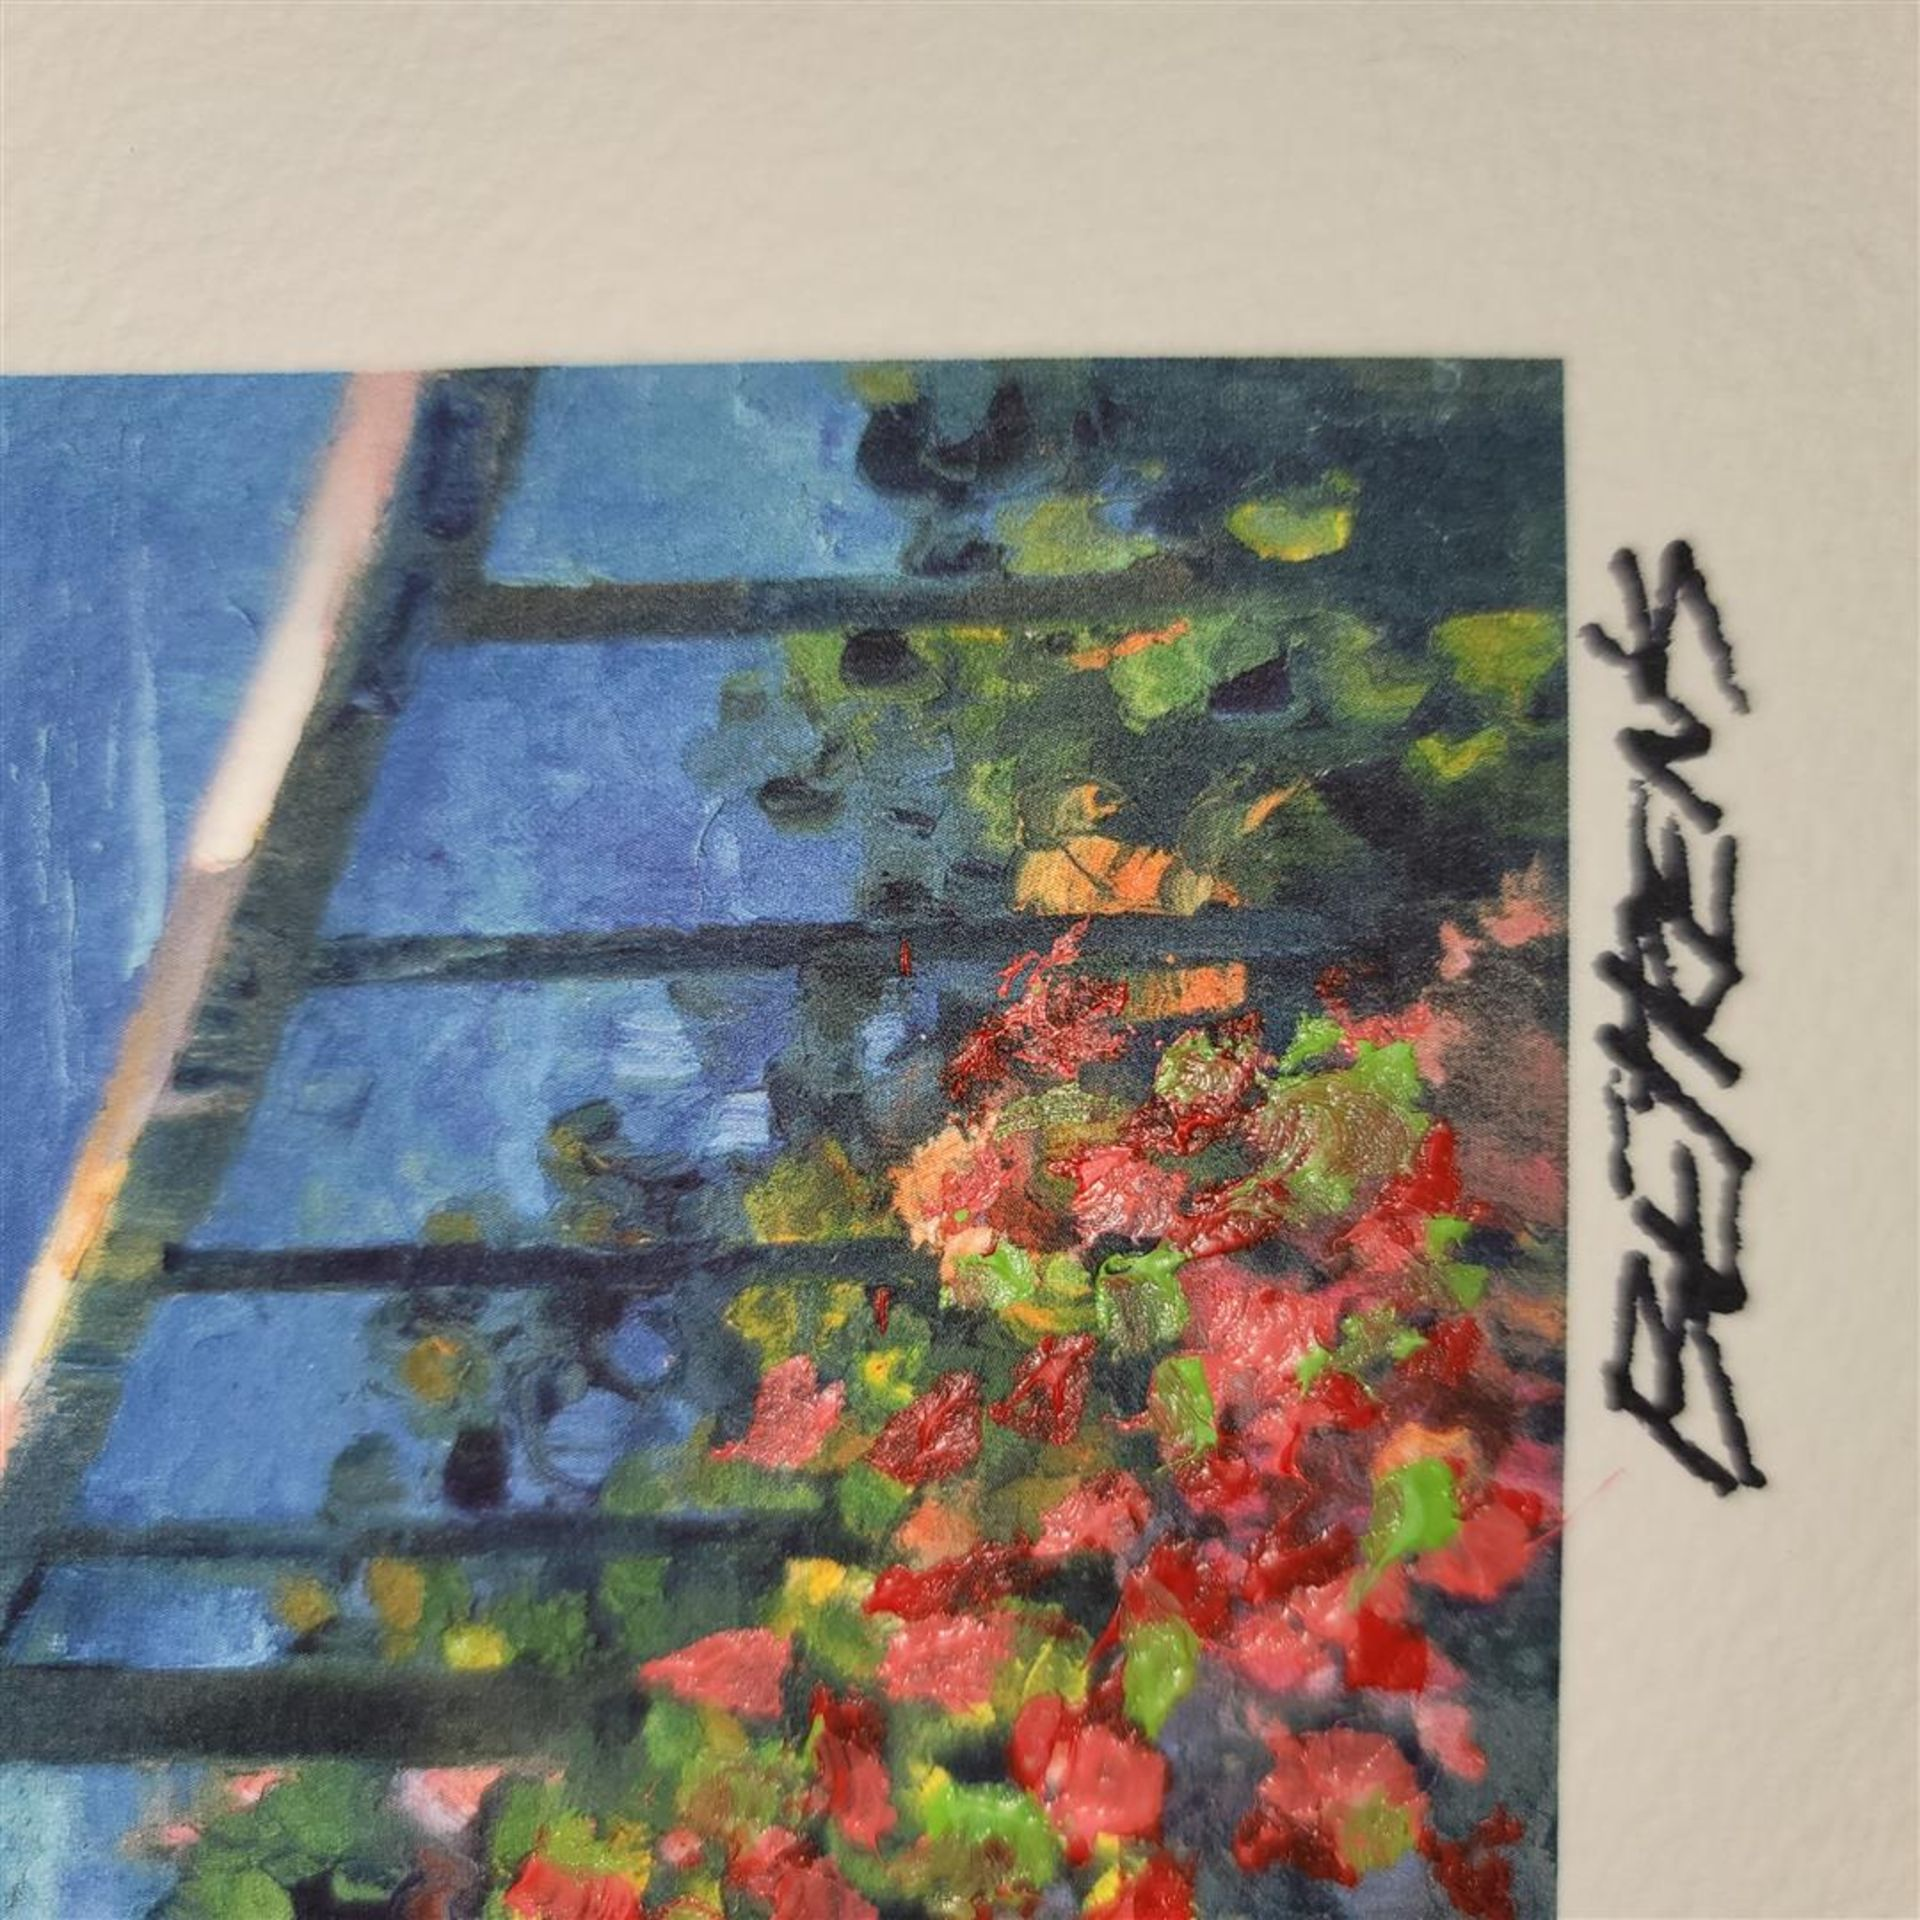 """Sunlit Stroll"" by Howard Behrens - Signed, Numbered, & Embellished - Image 2 of 4"